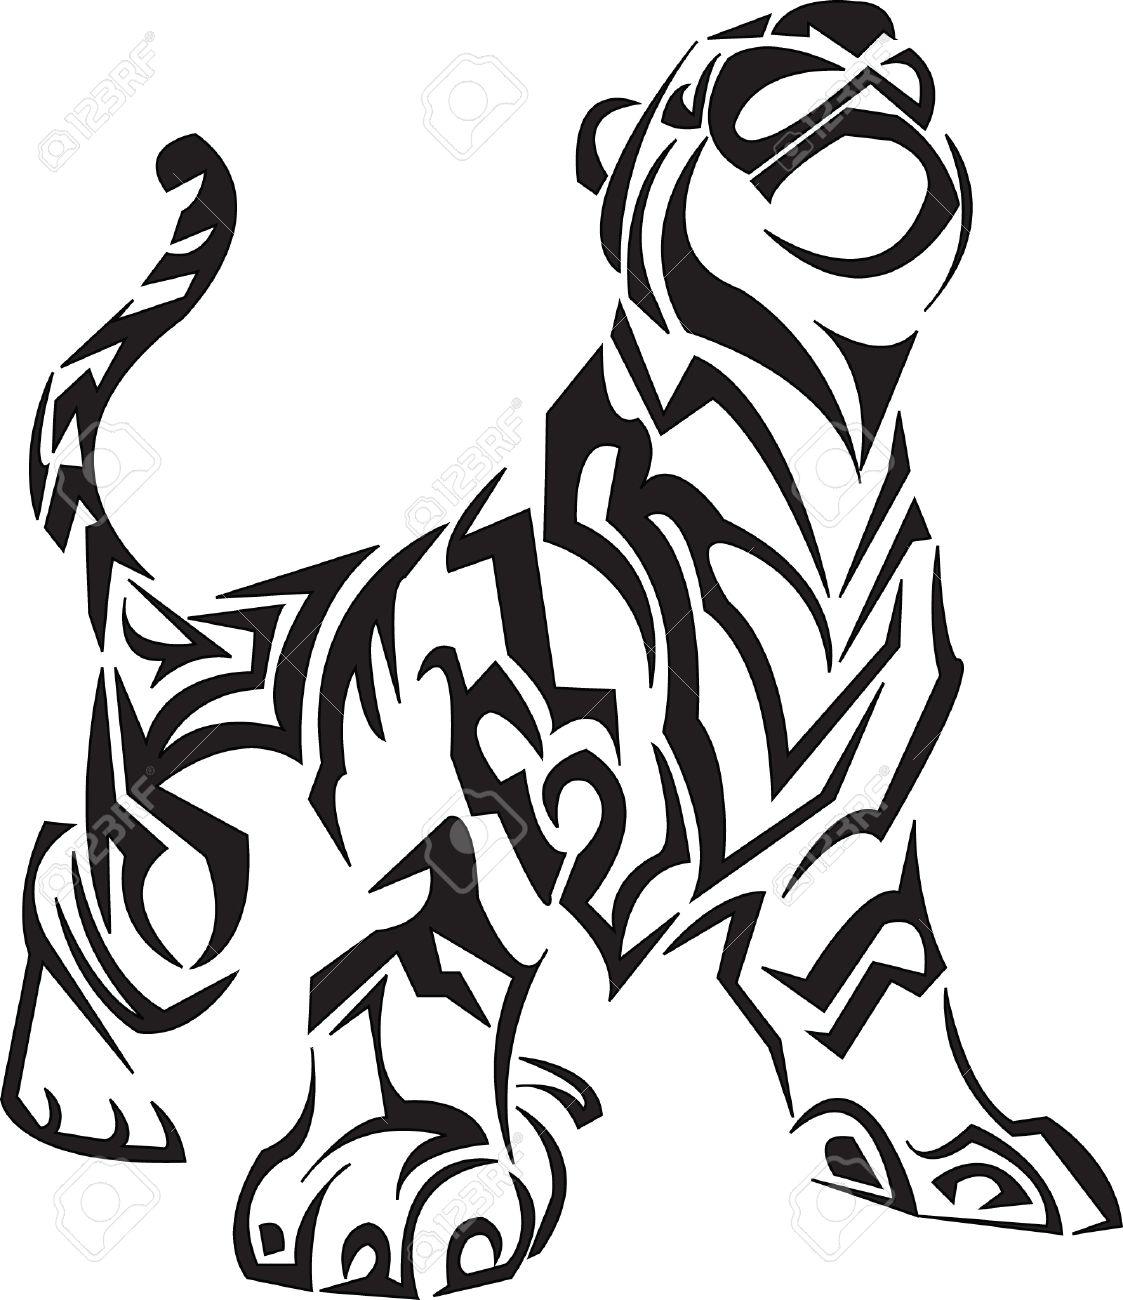 Tribal Tiger Tattoo Stock Vector - 5260755